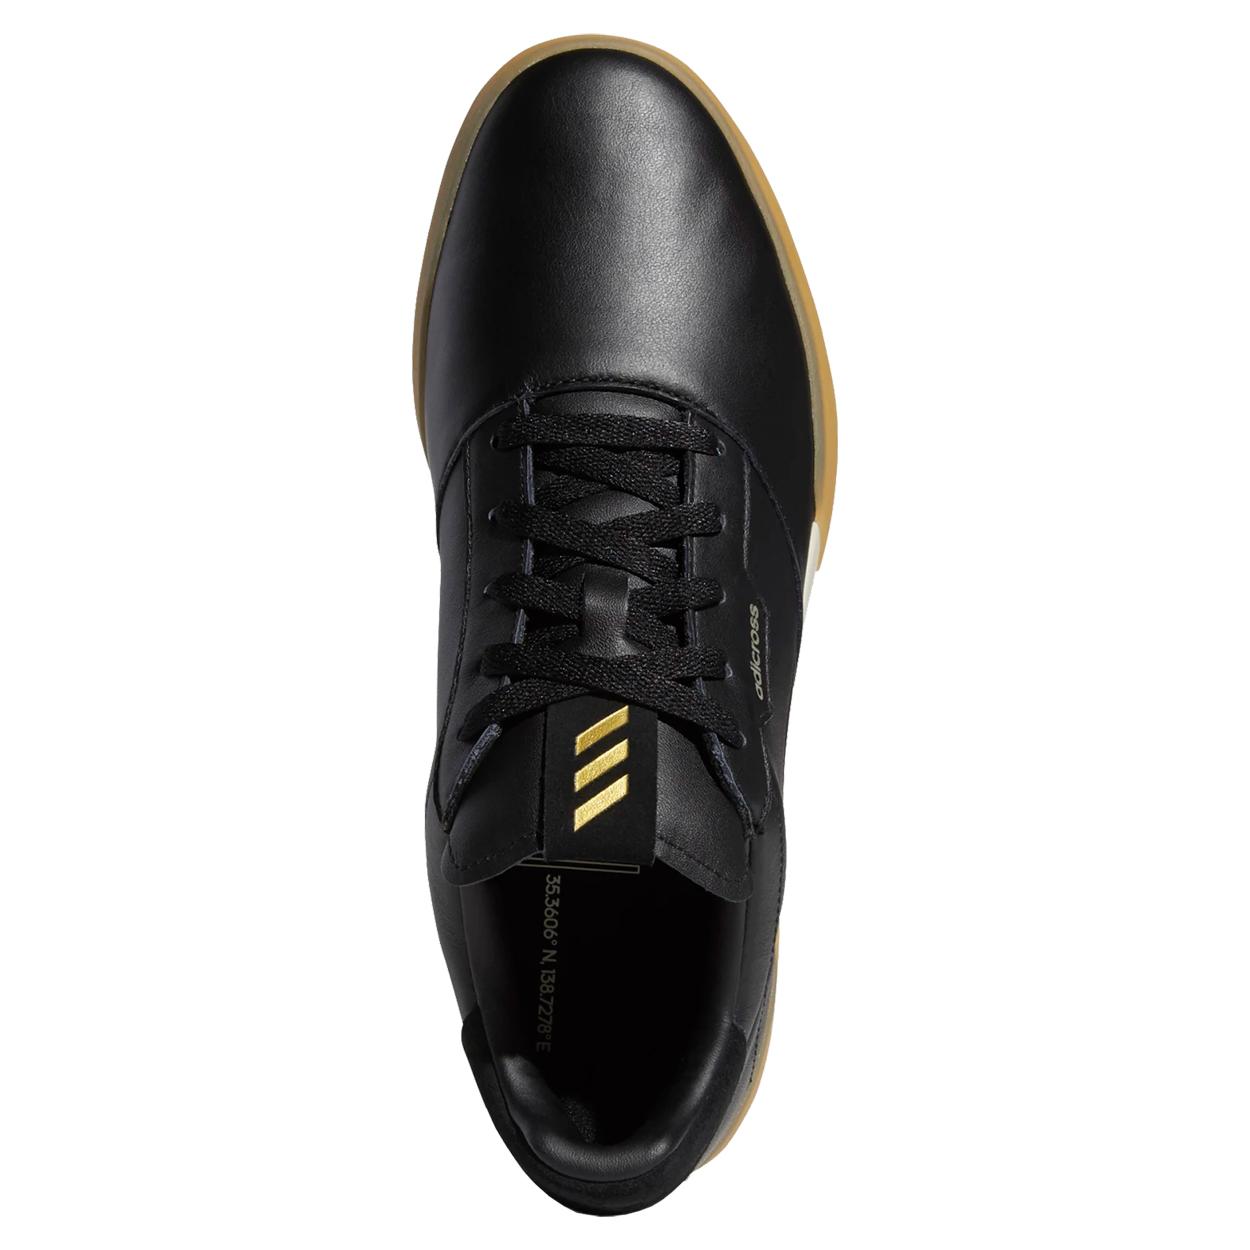 Adidas-Men-039-s-Adicross-Retro-Spikeless-Golf-Shoes-Brand-New thumbnail 6